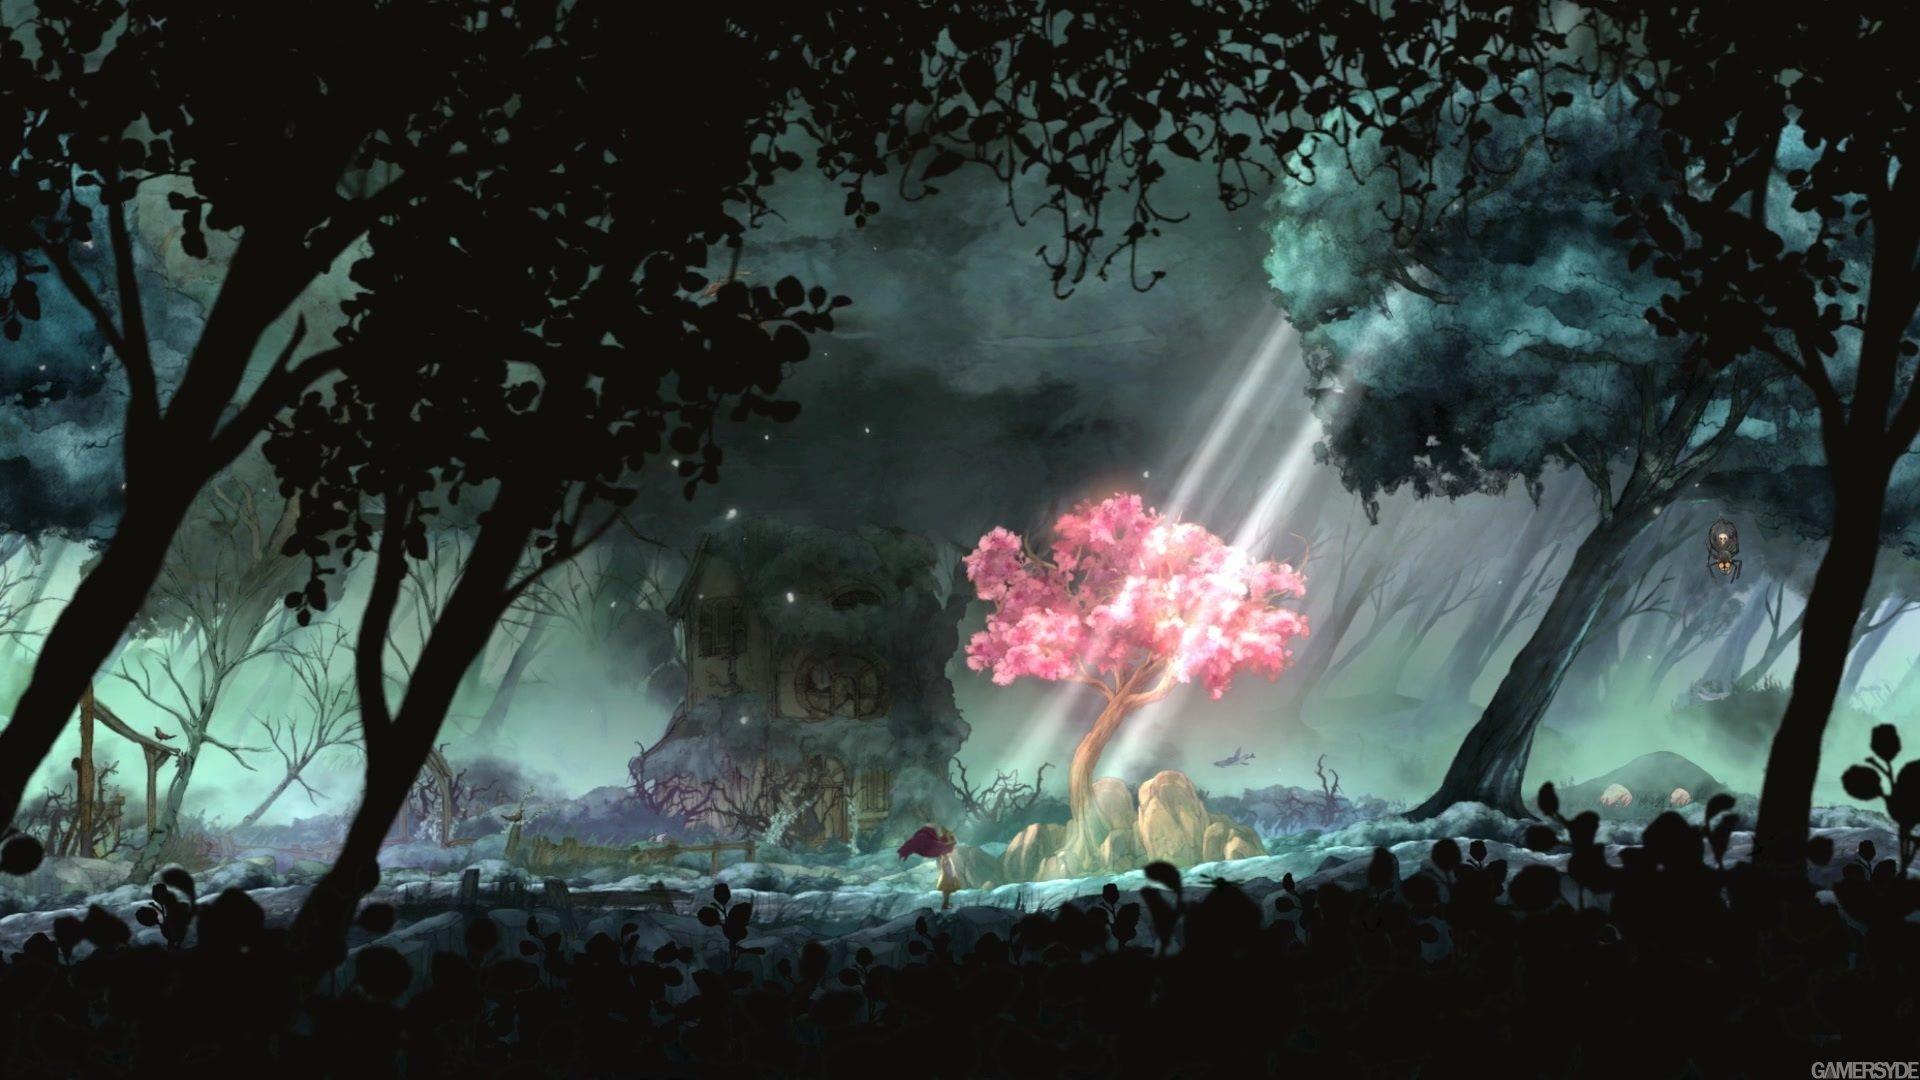 Image Child Of Light 24398 2822 0001 Jpg 1920 1080 Child Of Light World Of Warcraft Gold Lit Wallpaper